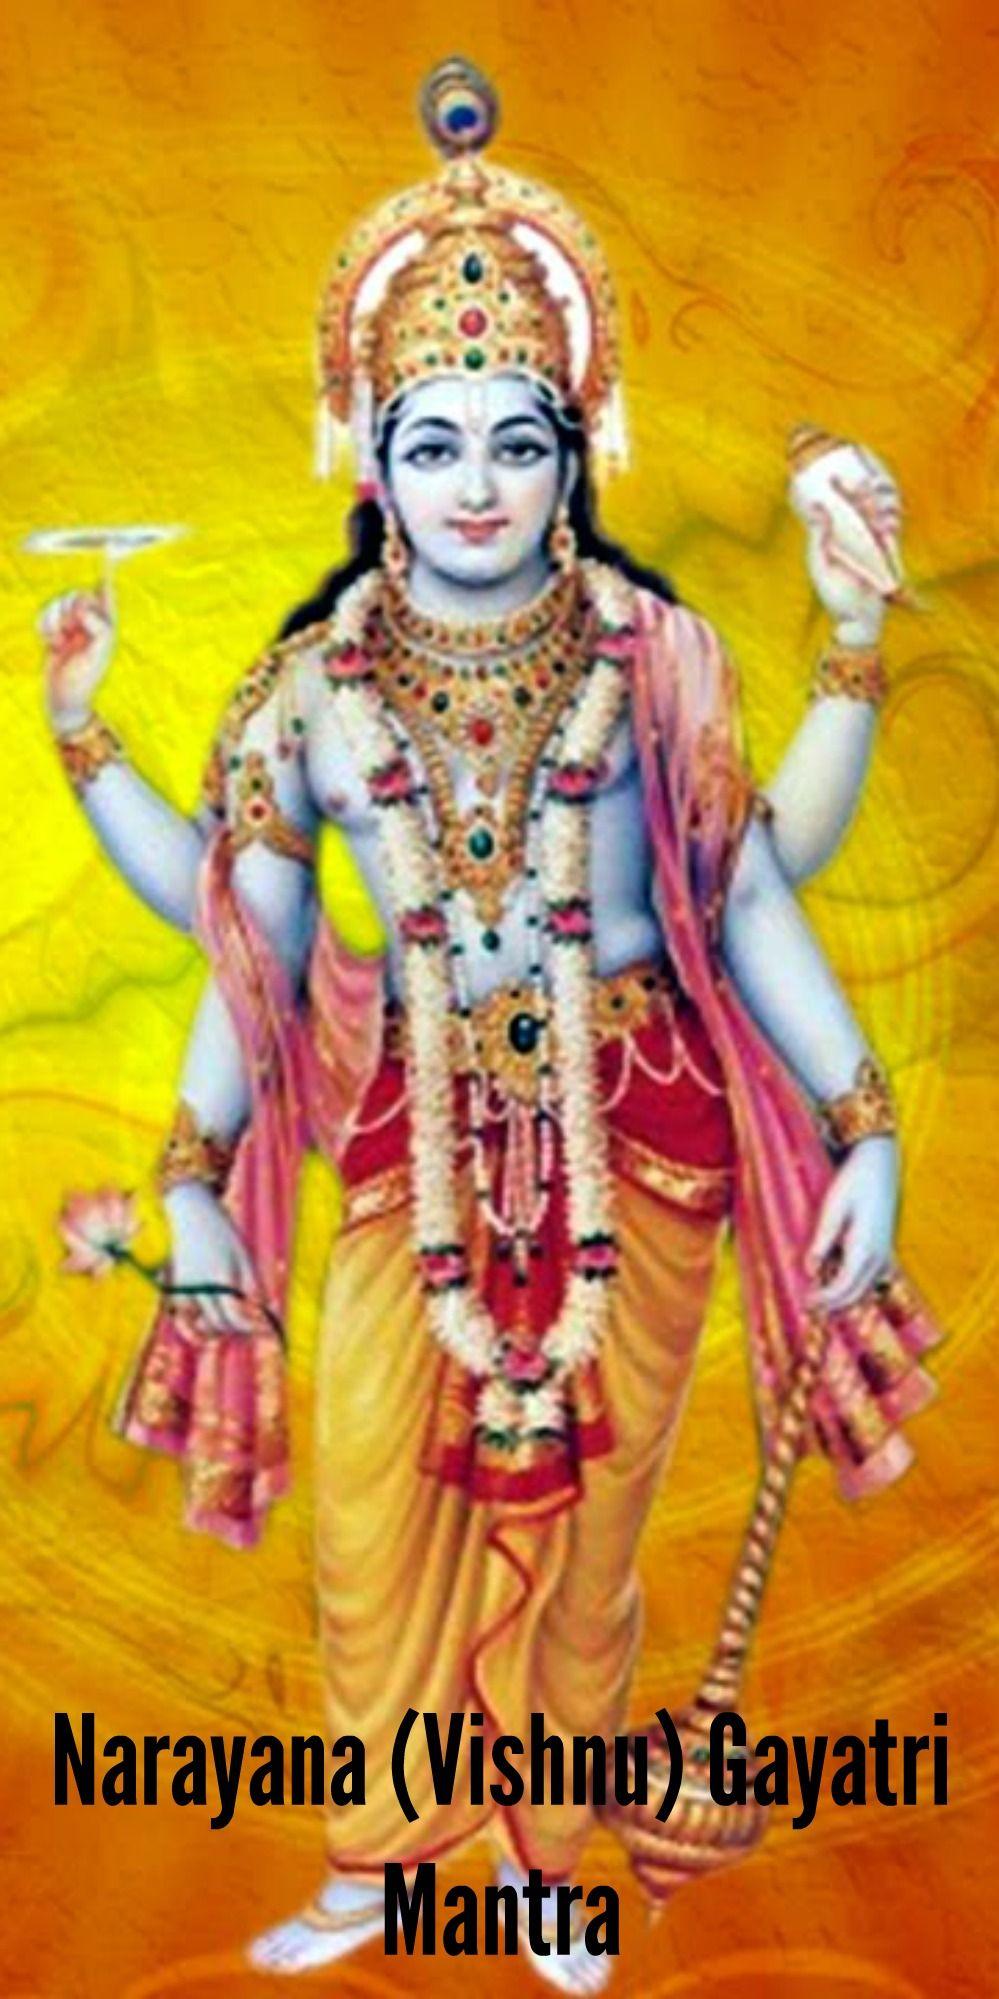 Narayana (Vishnu) Gayatri Mantra: Lyrics, Meaning and Benefits